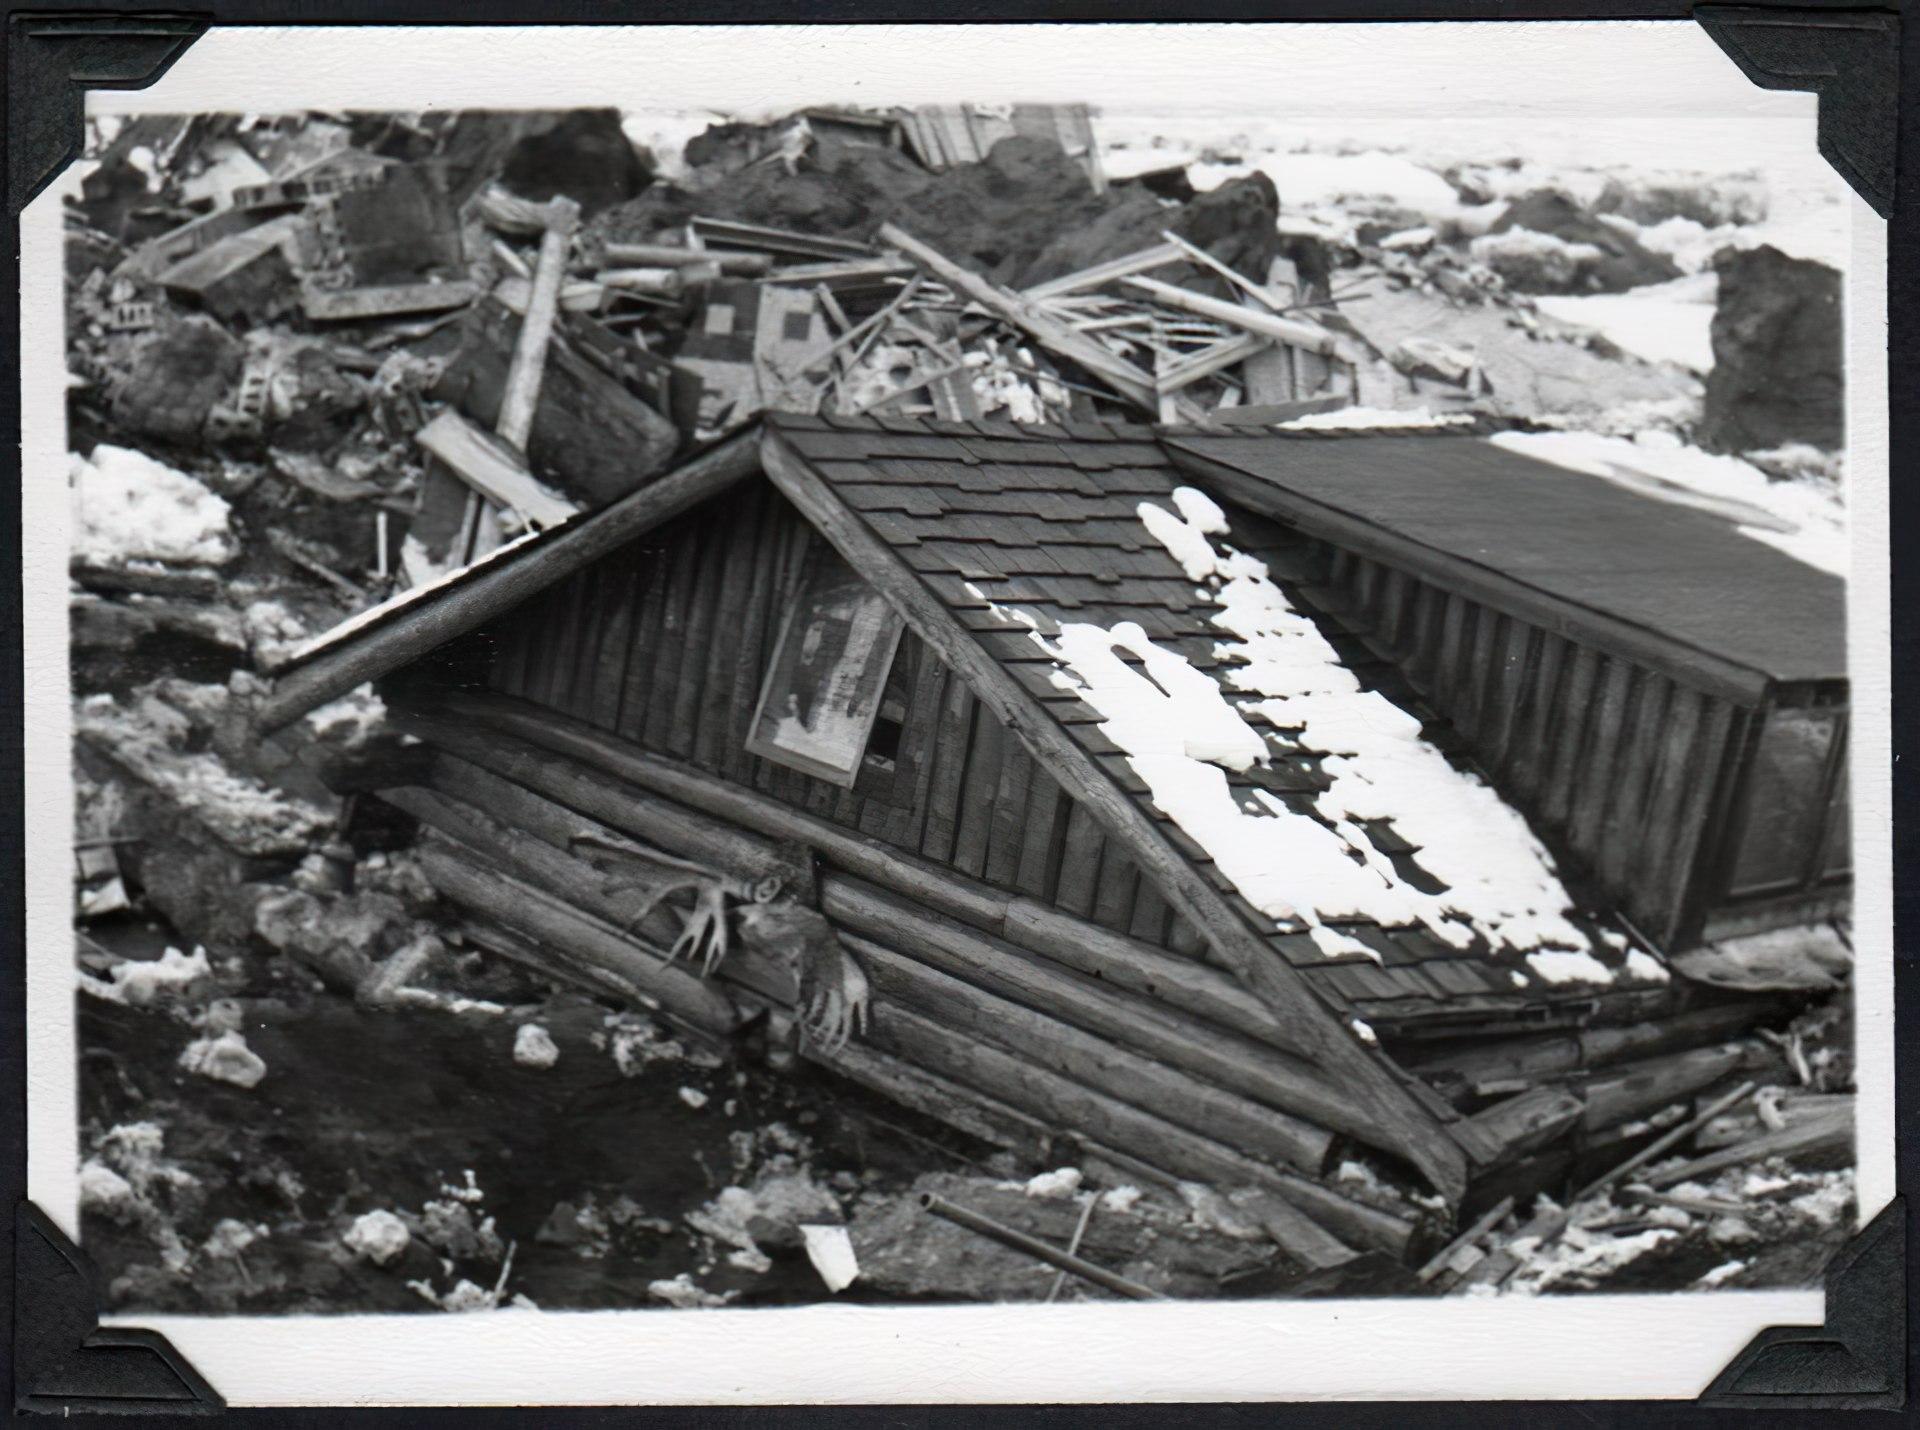 Good Friday earthquake damaged home in Anchorage Alaska